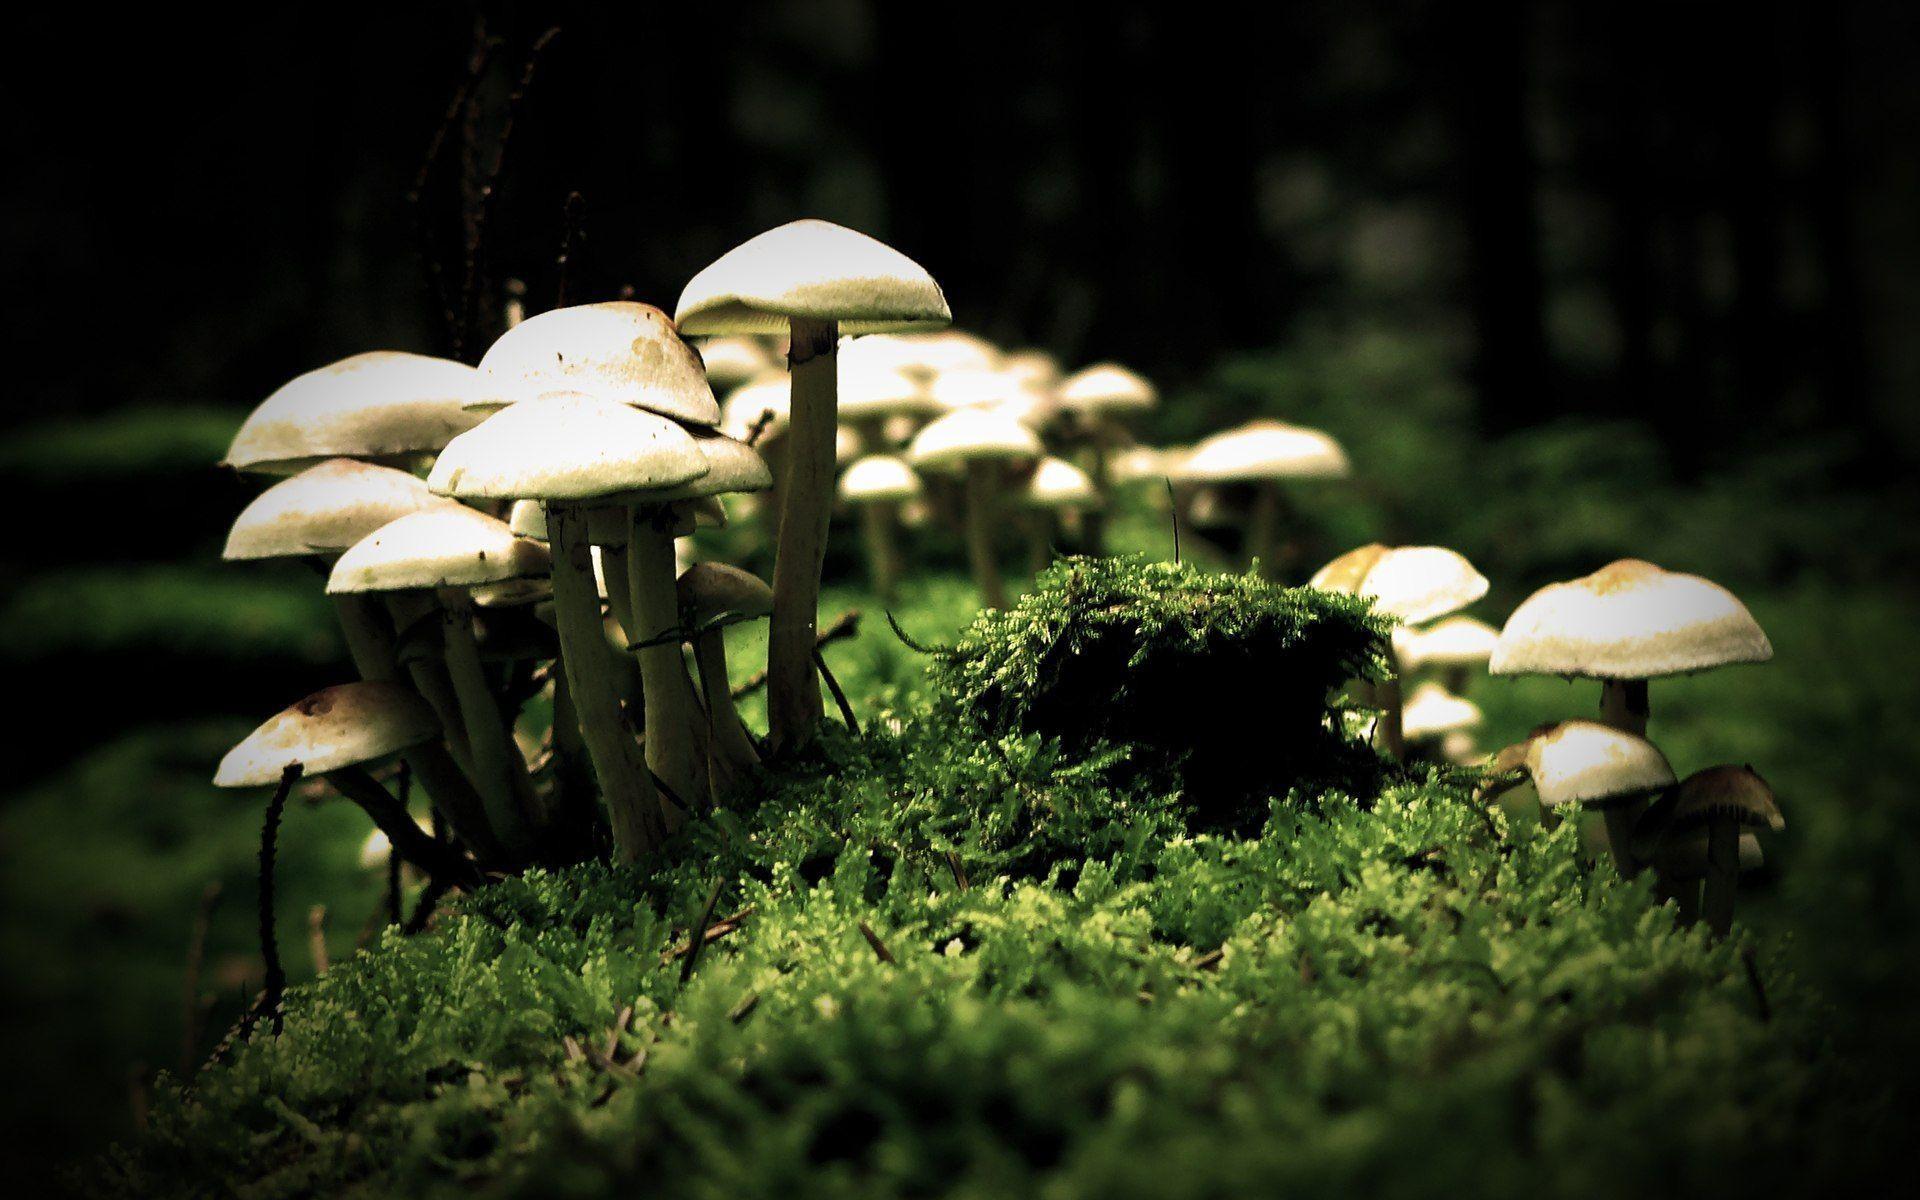 Res: 1920x1200, Mushrooms HD Wallpaper | Mushrooms Pictures | Cool Wallpapers